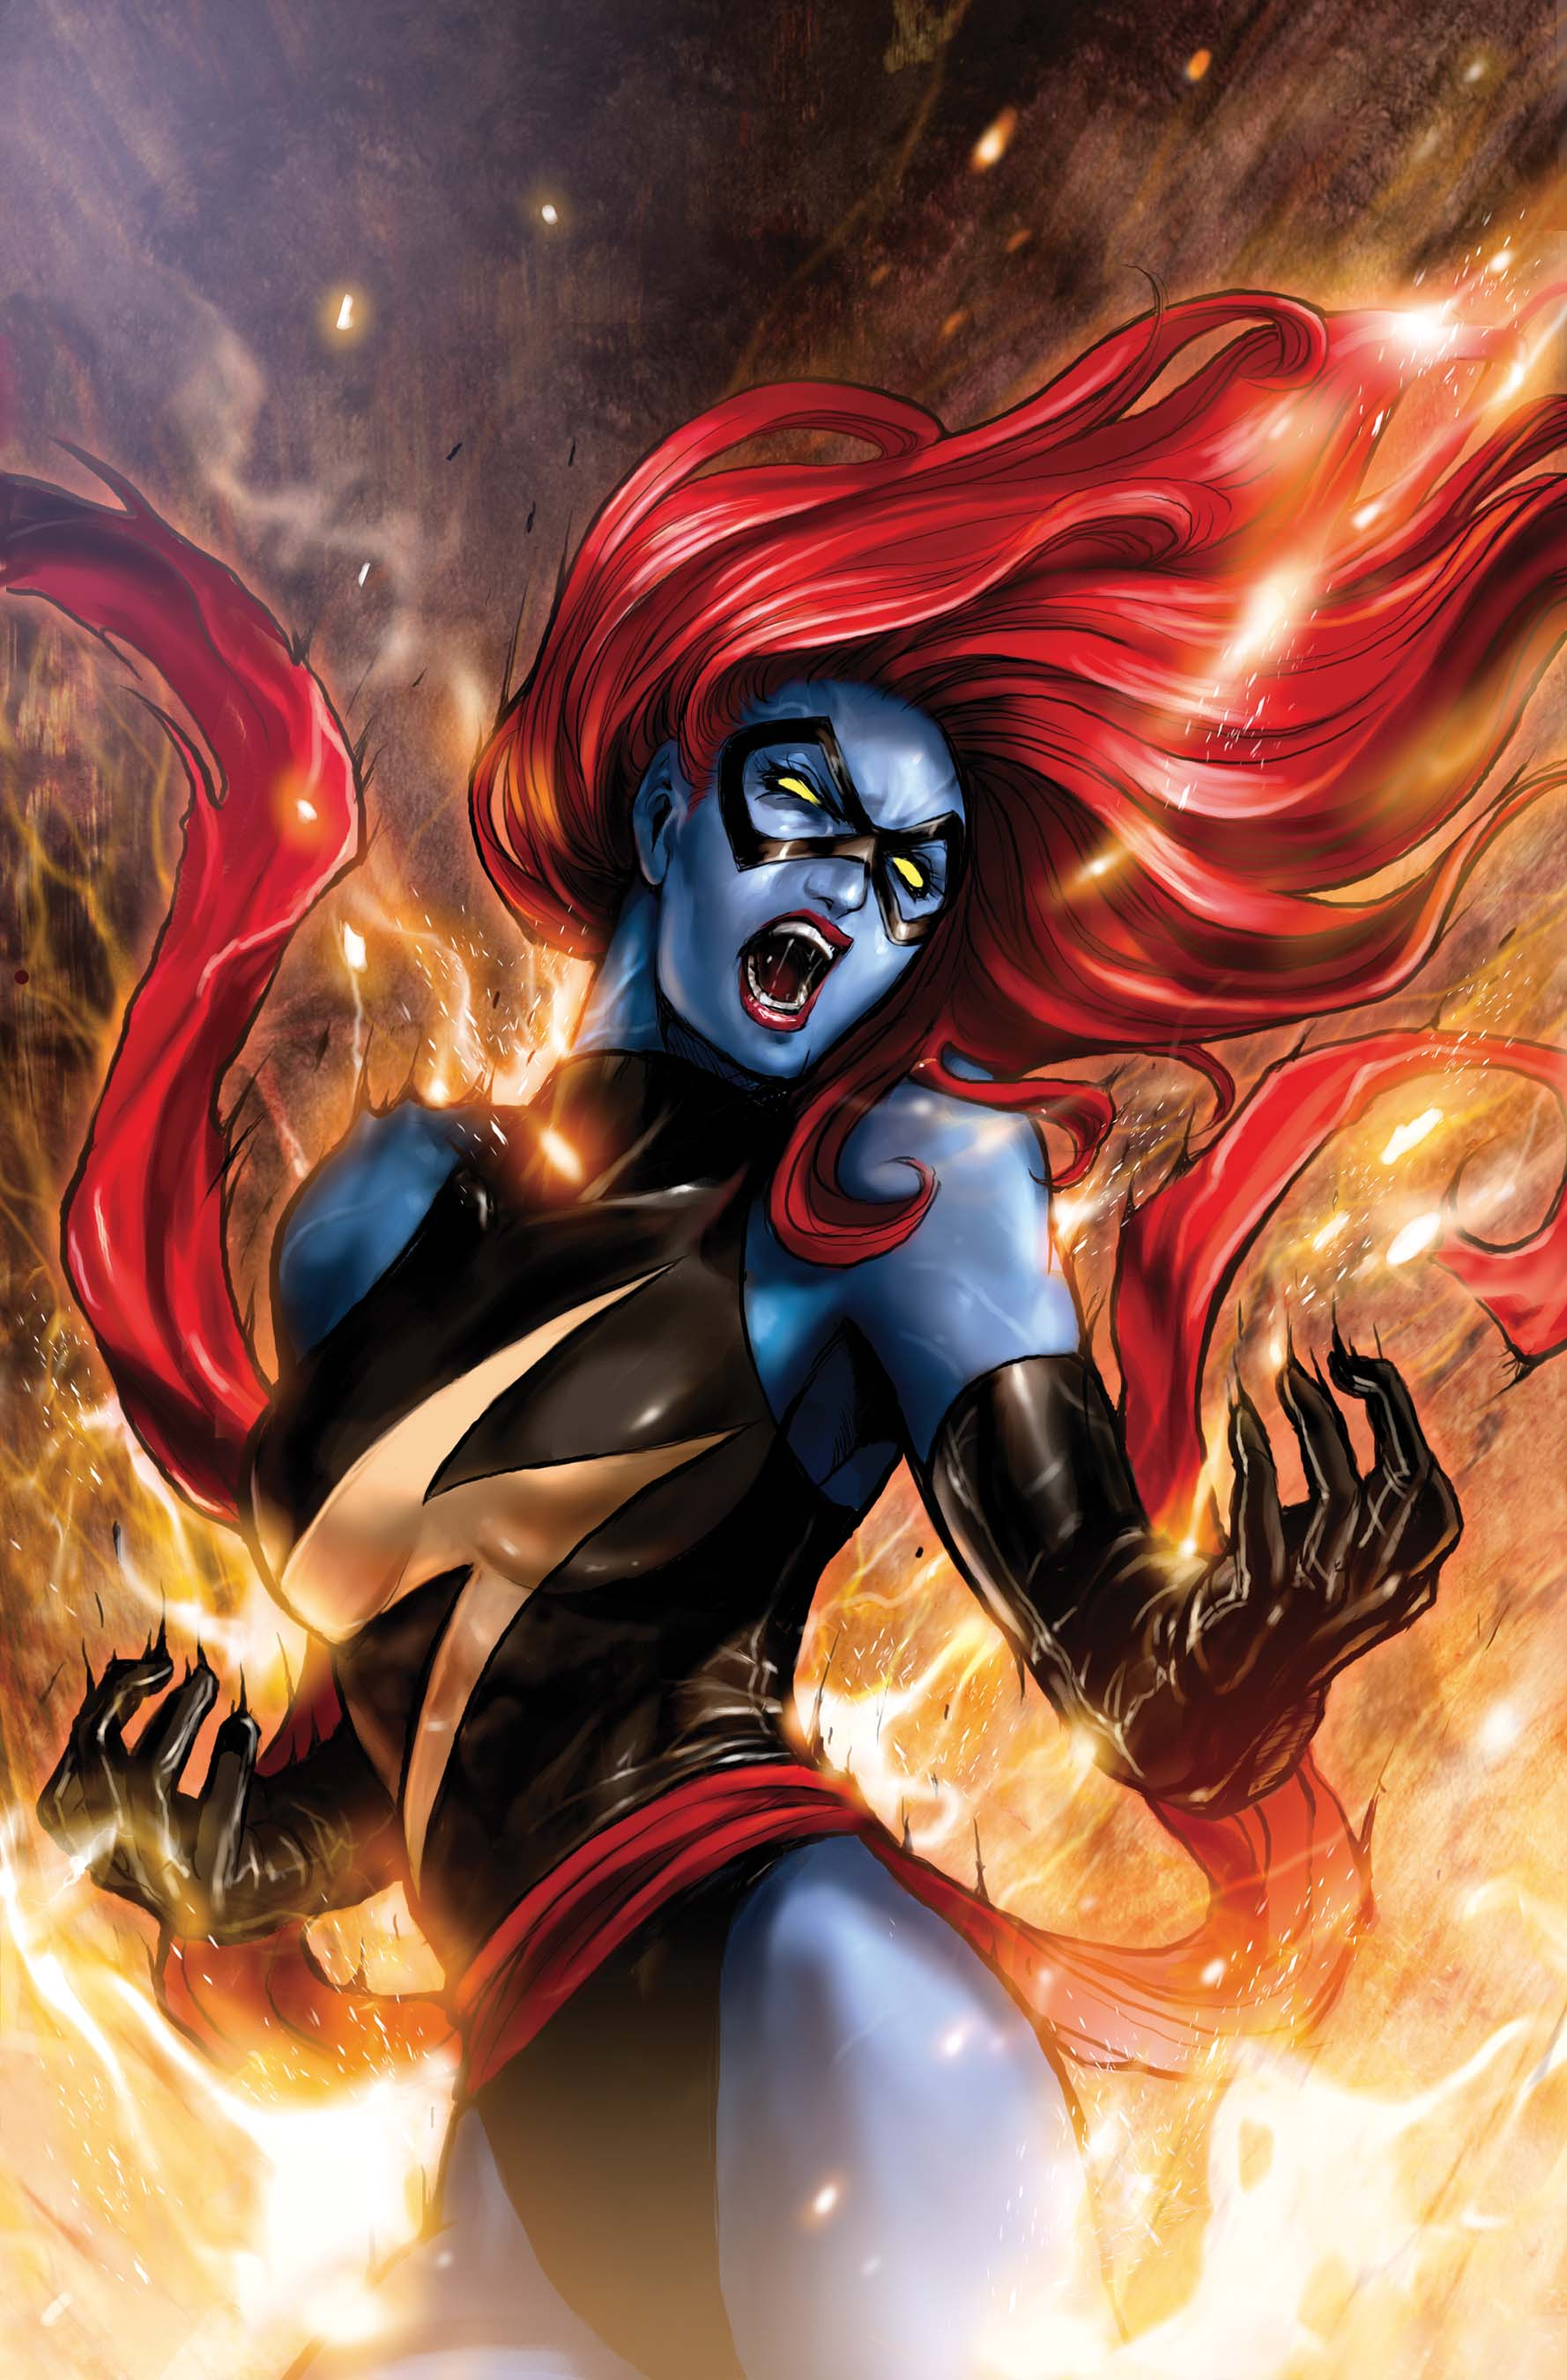 X-Men Vol 2 9 | Marvel Database | FANDOM powered by Wikia